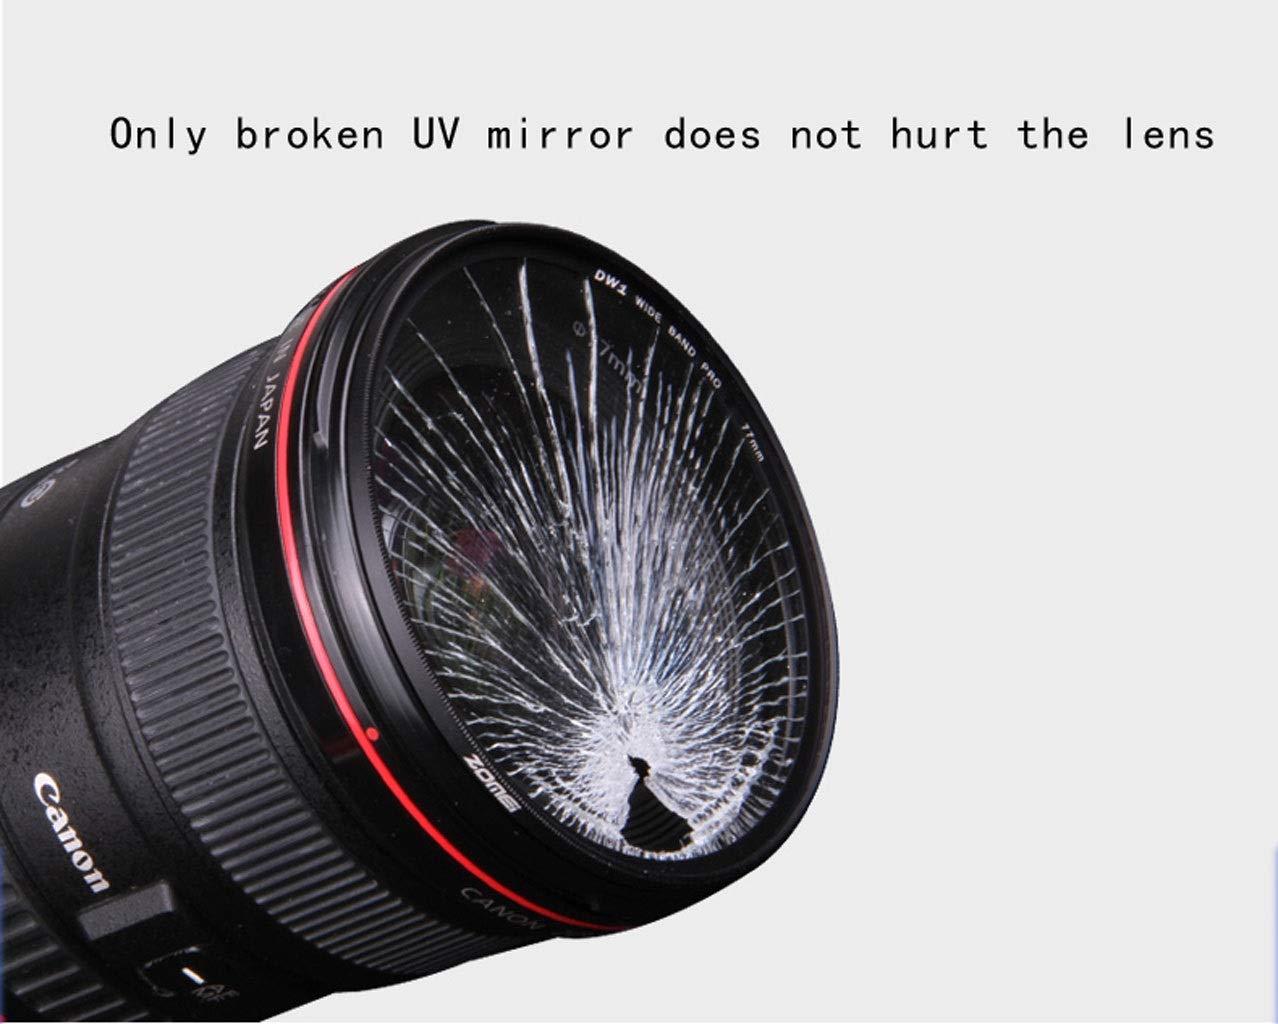 Wangclj Coated UV Lens Filter Protection for All Digital SLR Cameras Size : 77mm